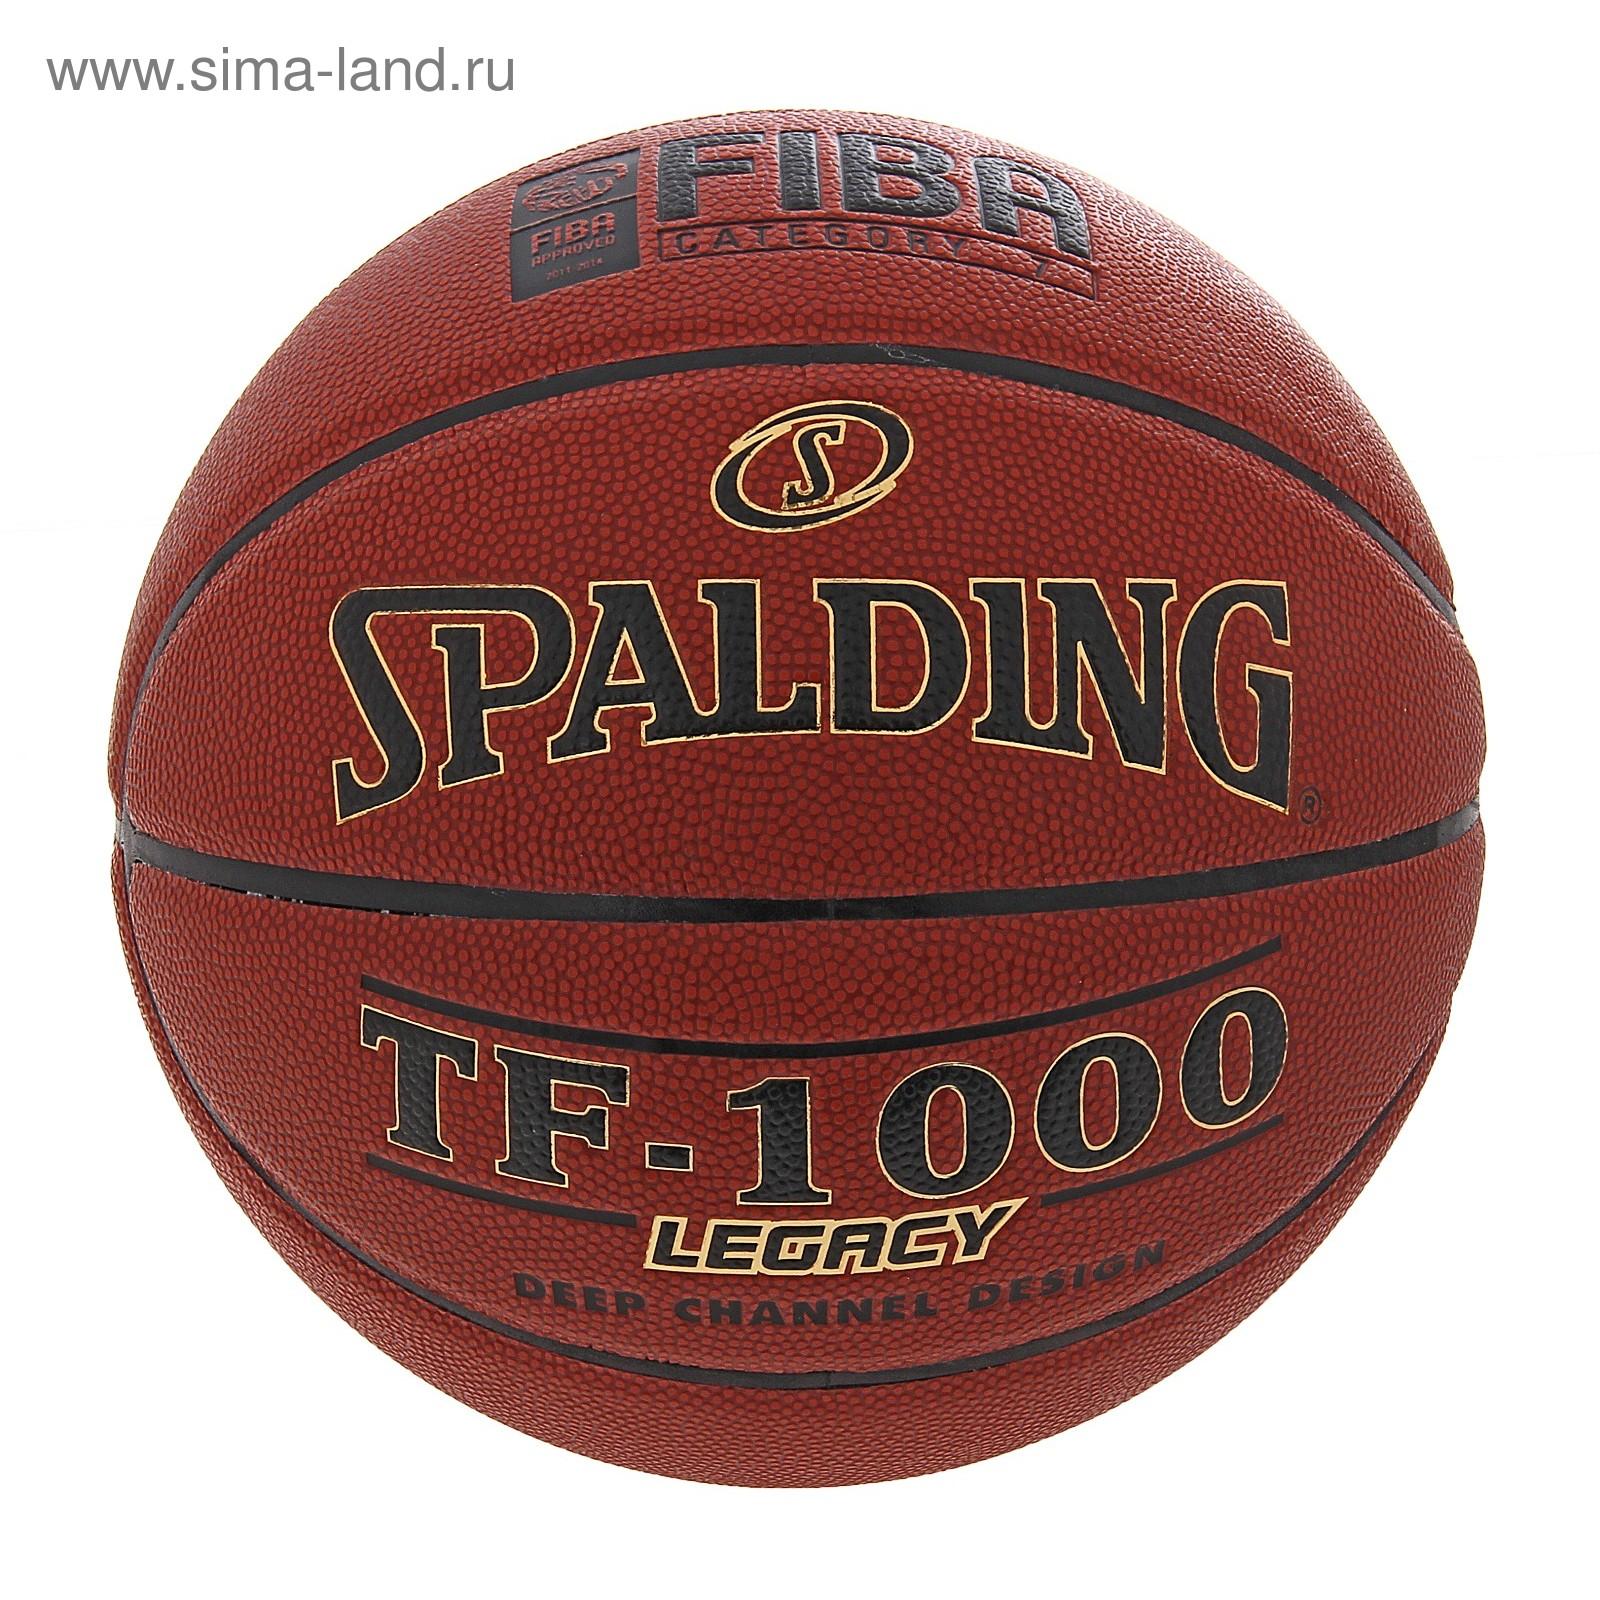 9f1140fc Мяч баскетбольный Spalding TF-1000 Legacy, 74-450z, размер 7 (785308 ...